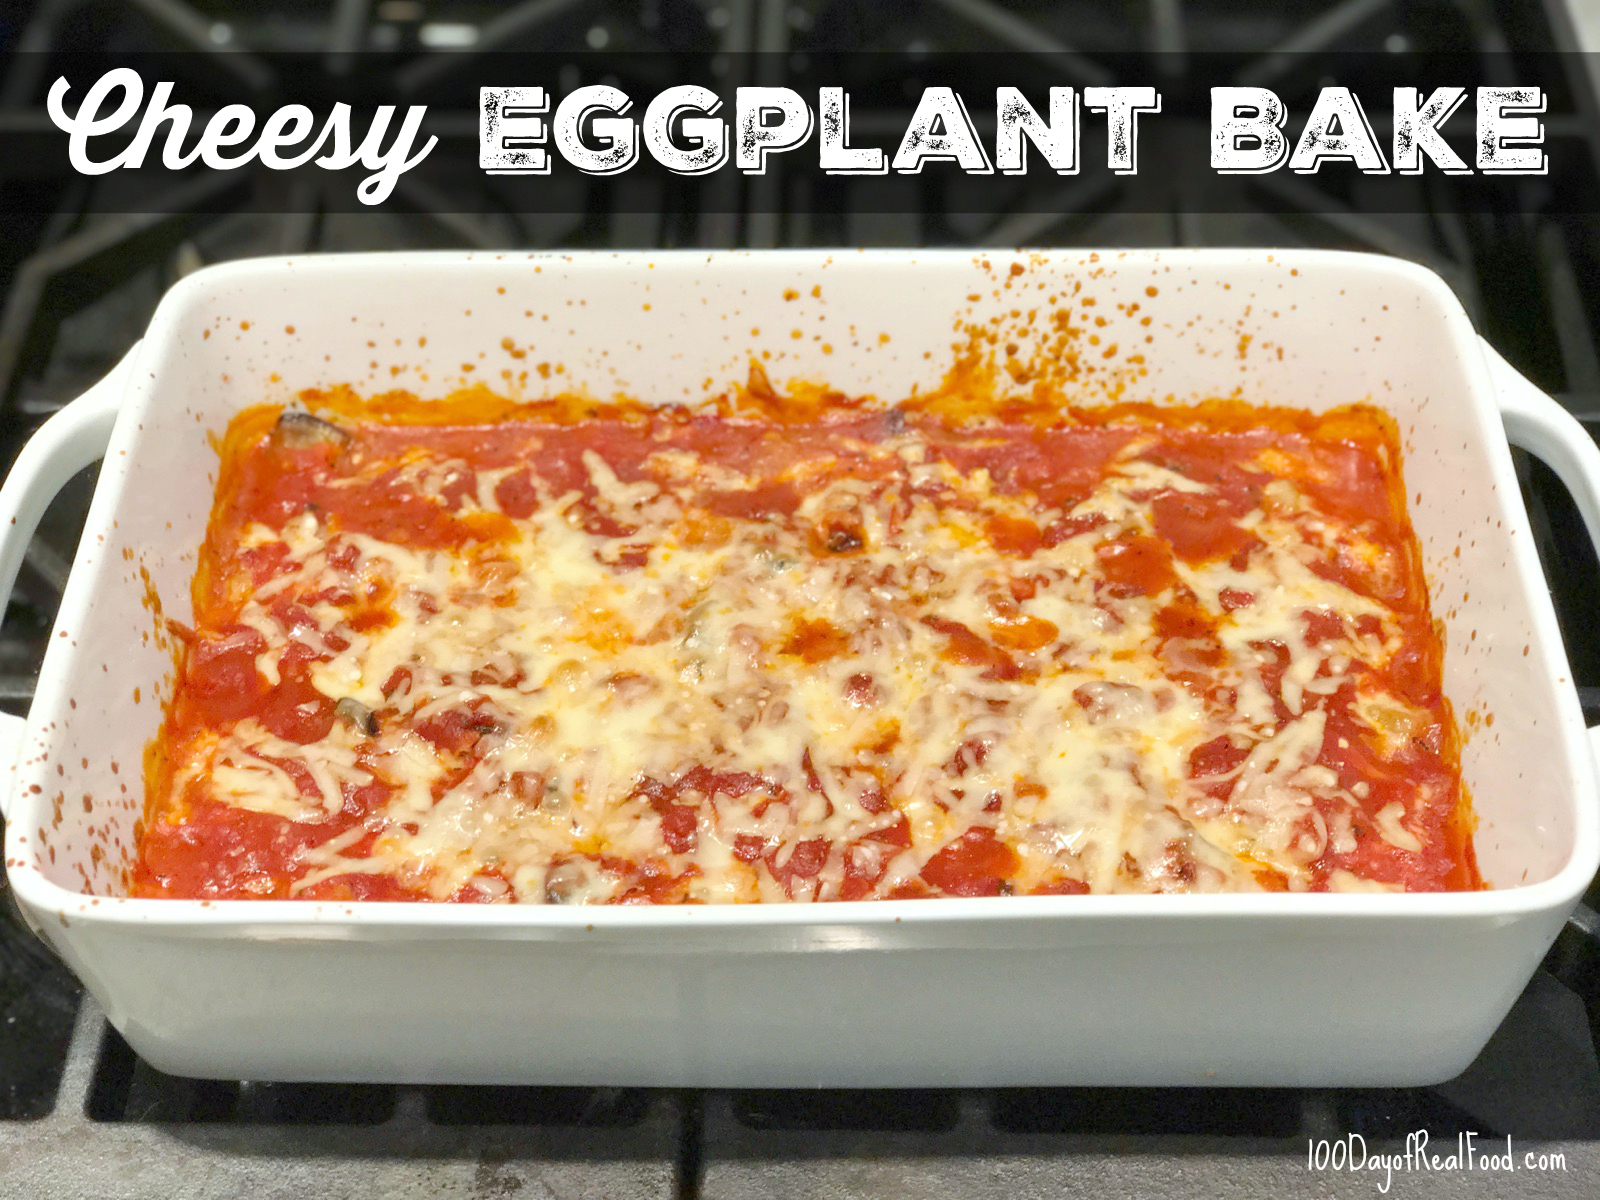 Cheesy Eggplant Bake